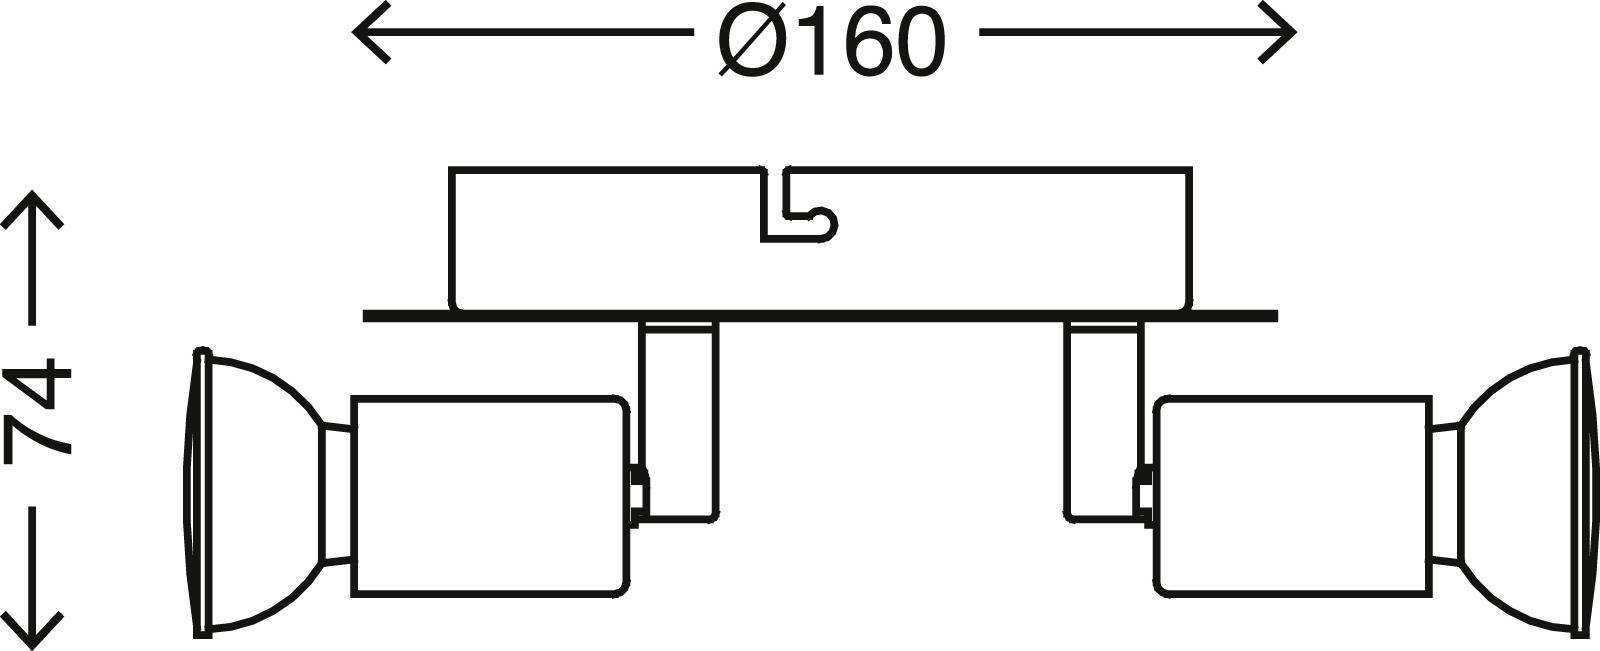 LED Spot Deckenleuchte, Ø 16 cm, 9 W, Chrom